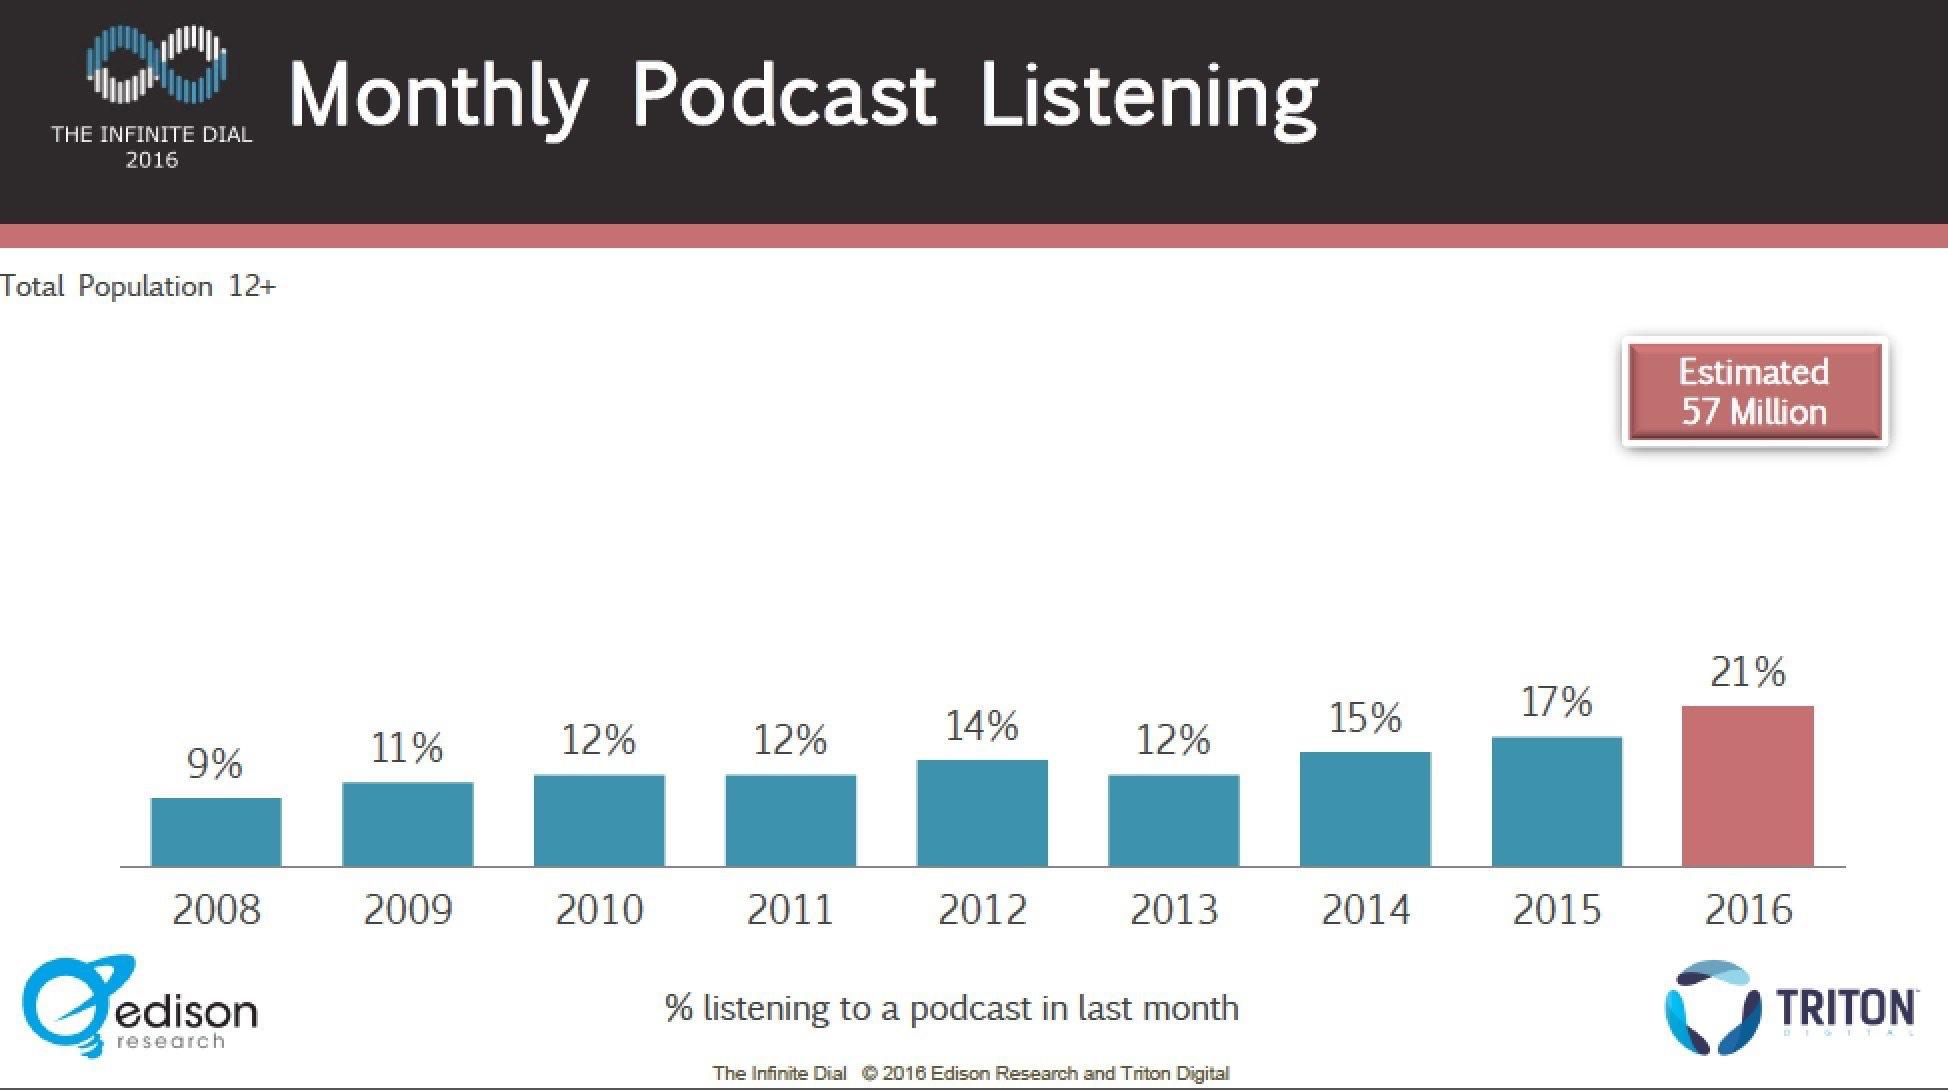 podcast listening data